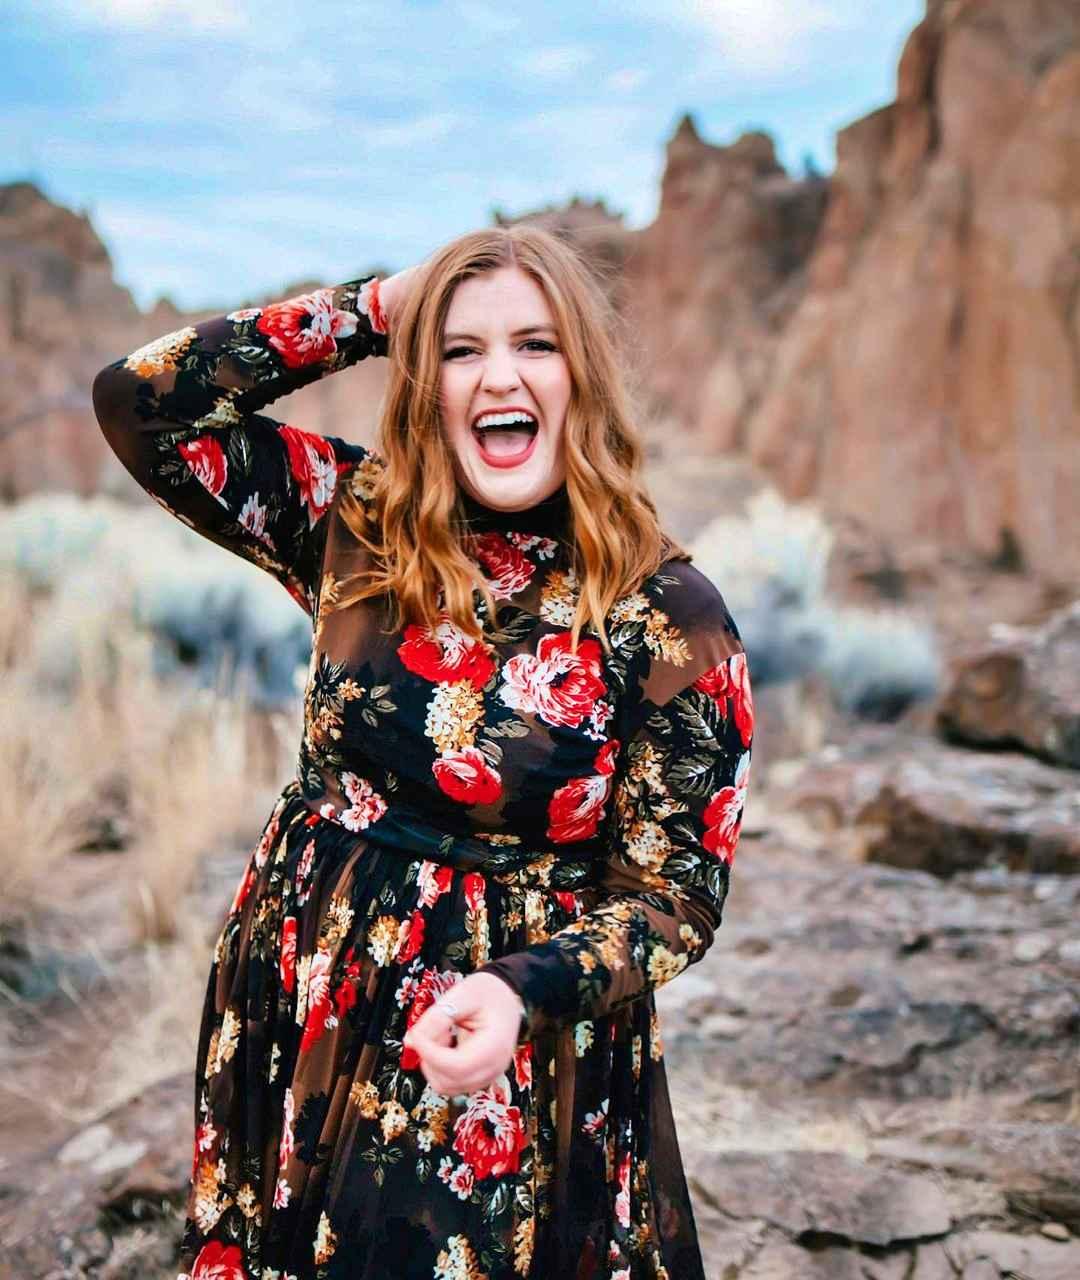 Isabel Roloff of Little People Big World speaks back at weight shamers